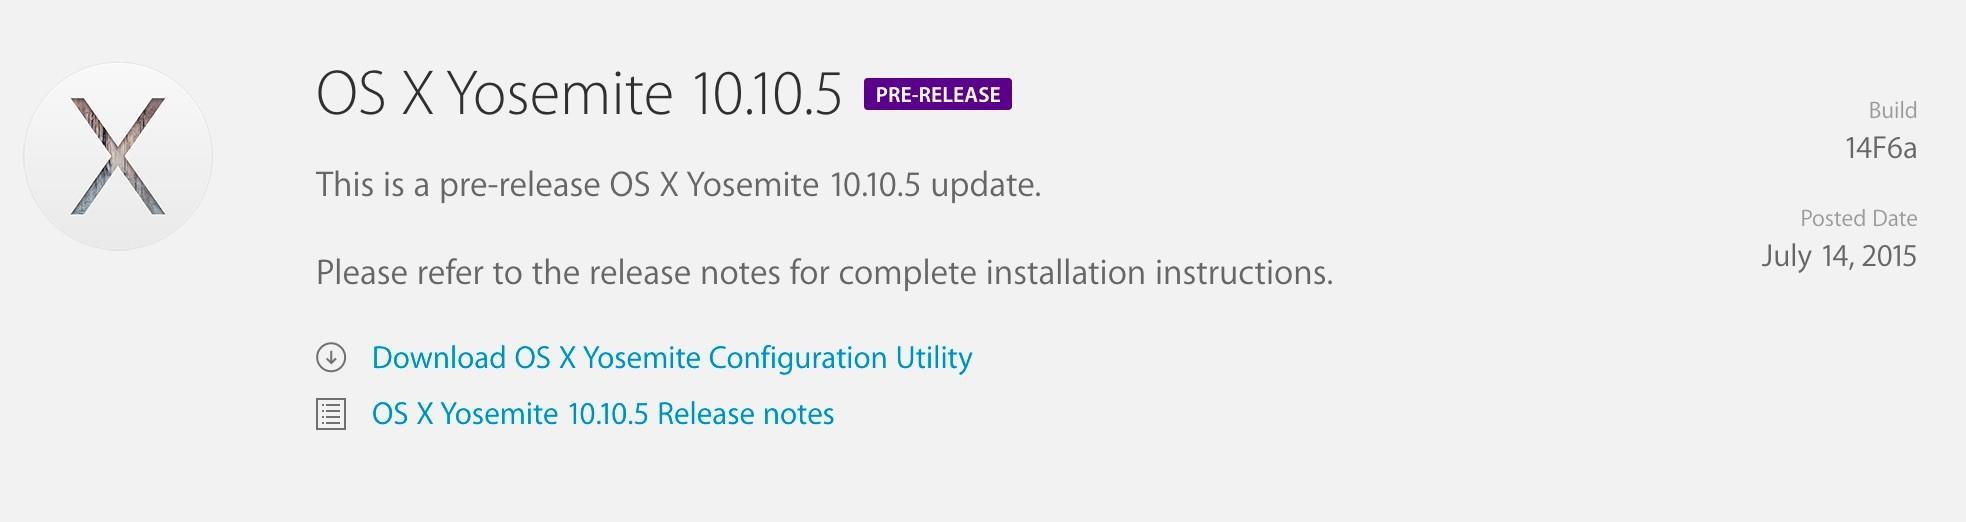 OS-X-Yosemite-10-10-5